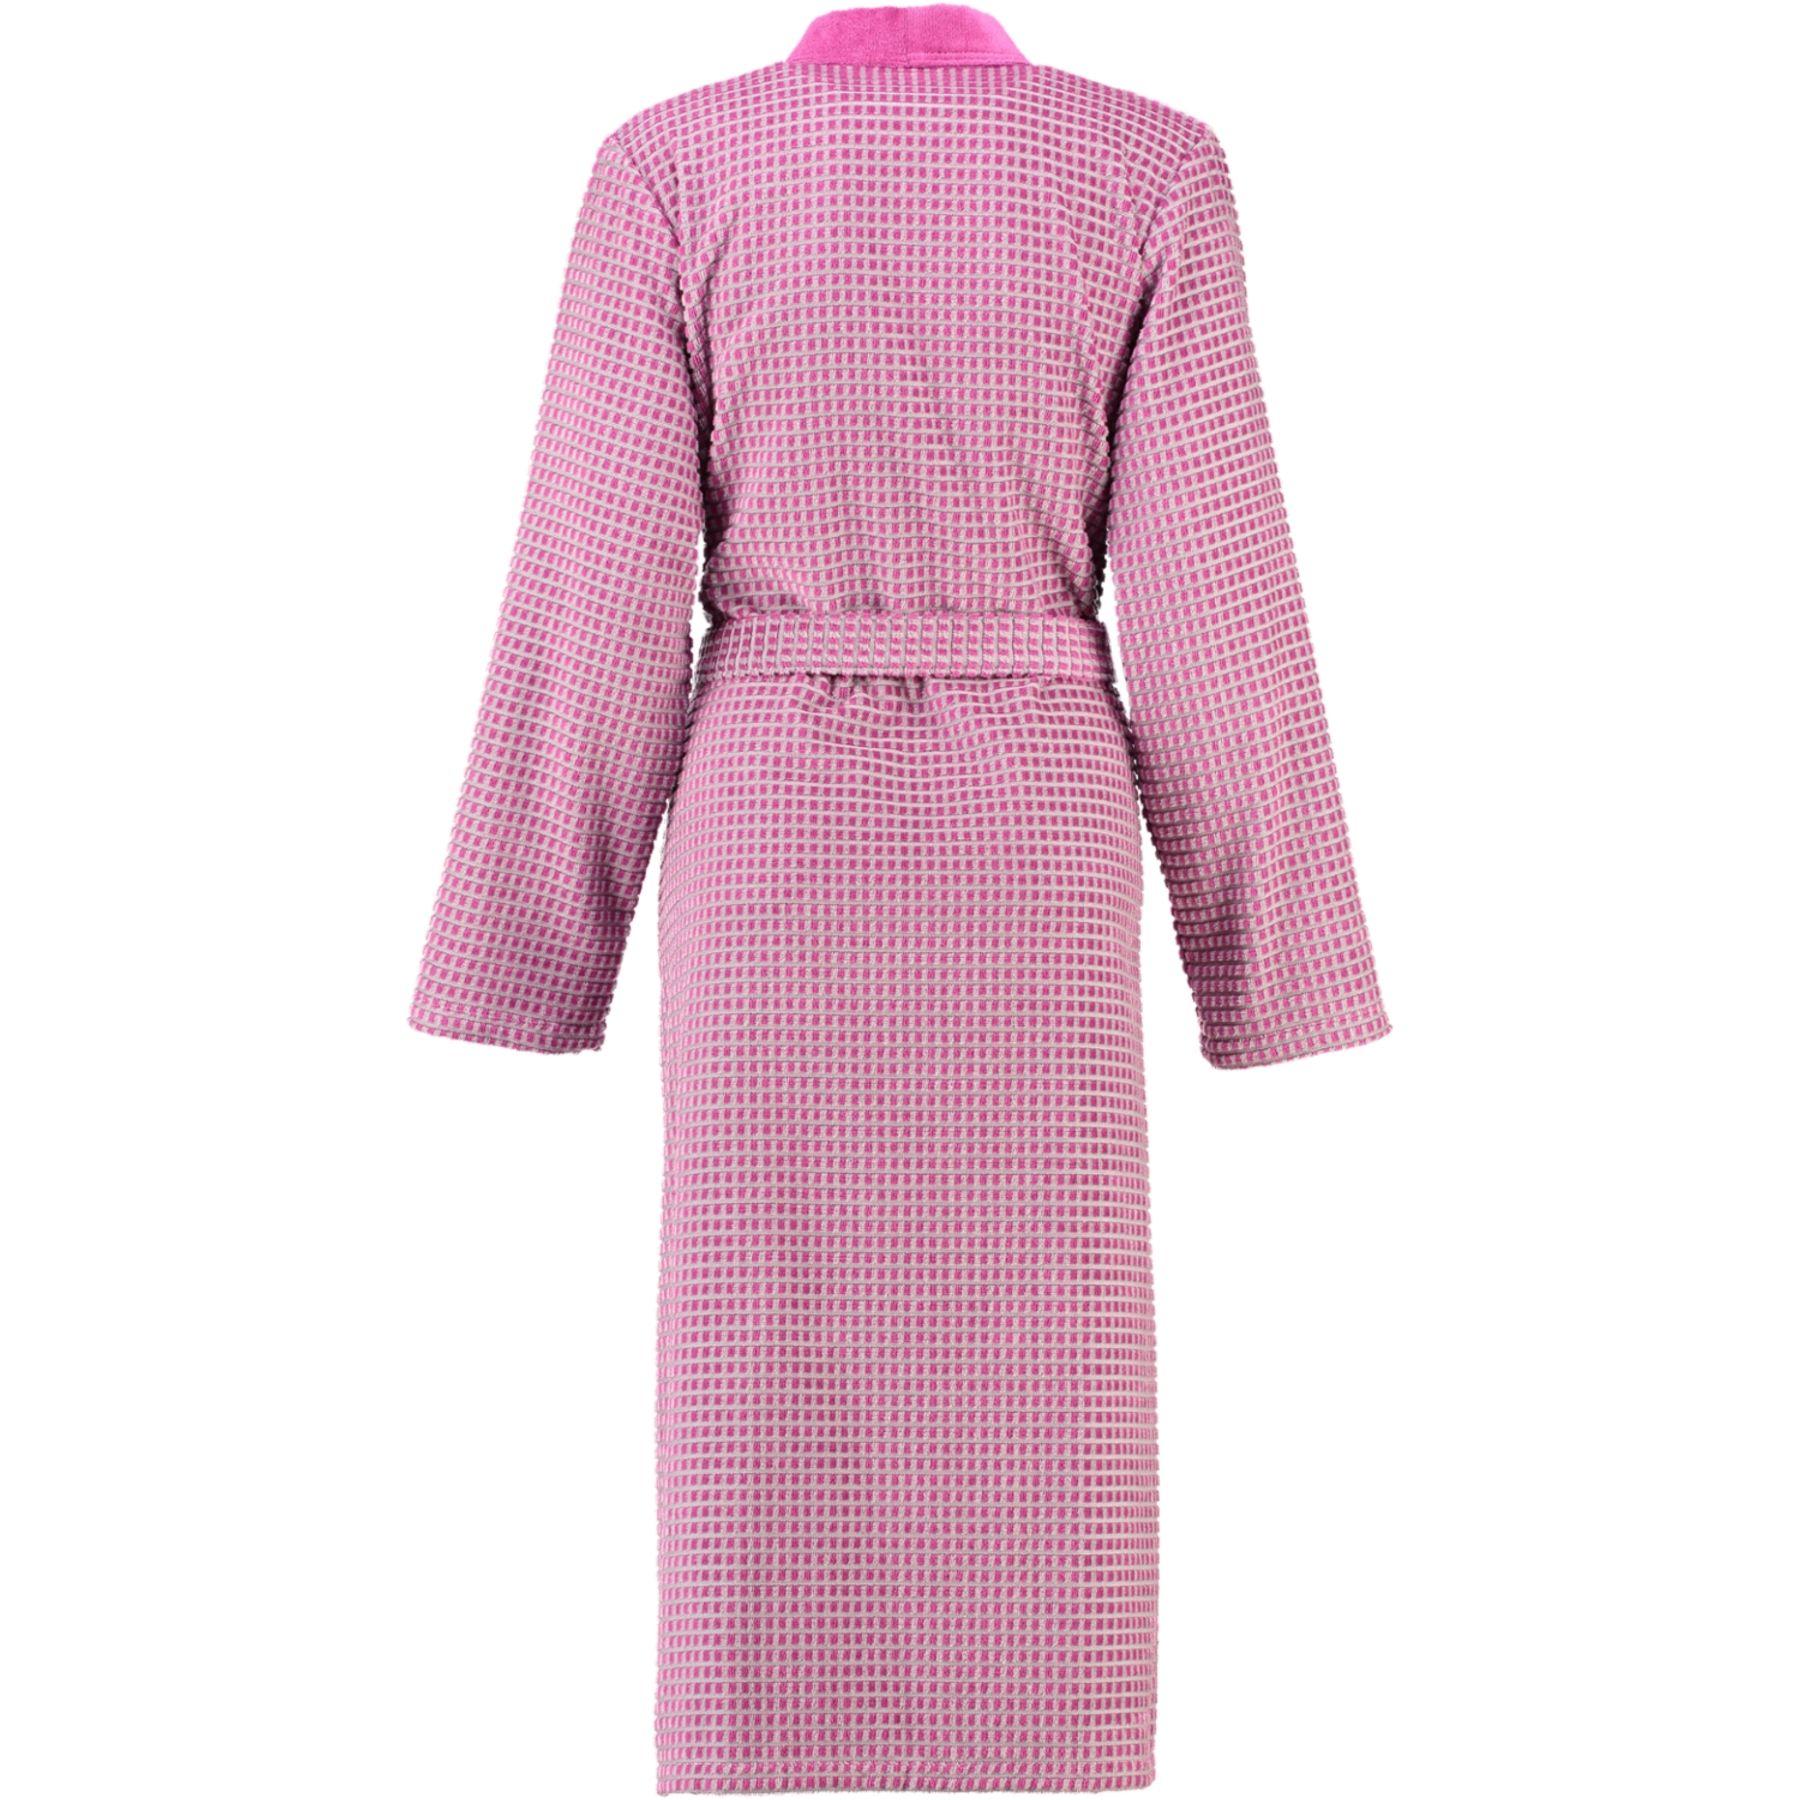 Cawö - Damen Walkvelours-Bademantel in Kimono-Form (4346) – Bild 2